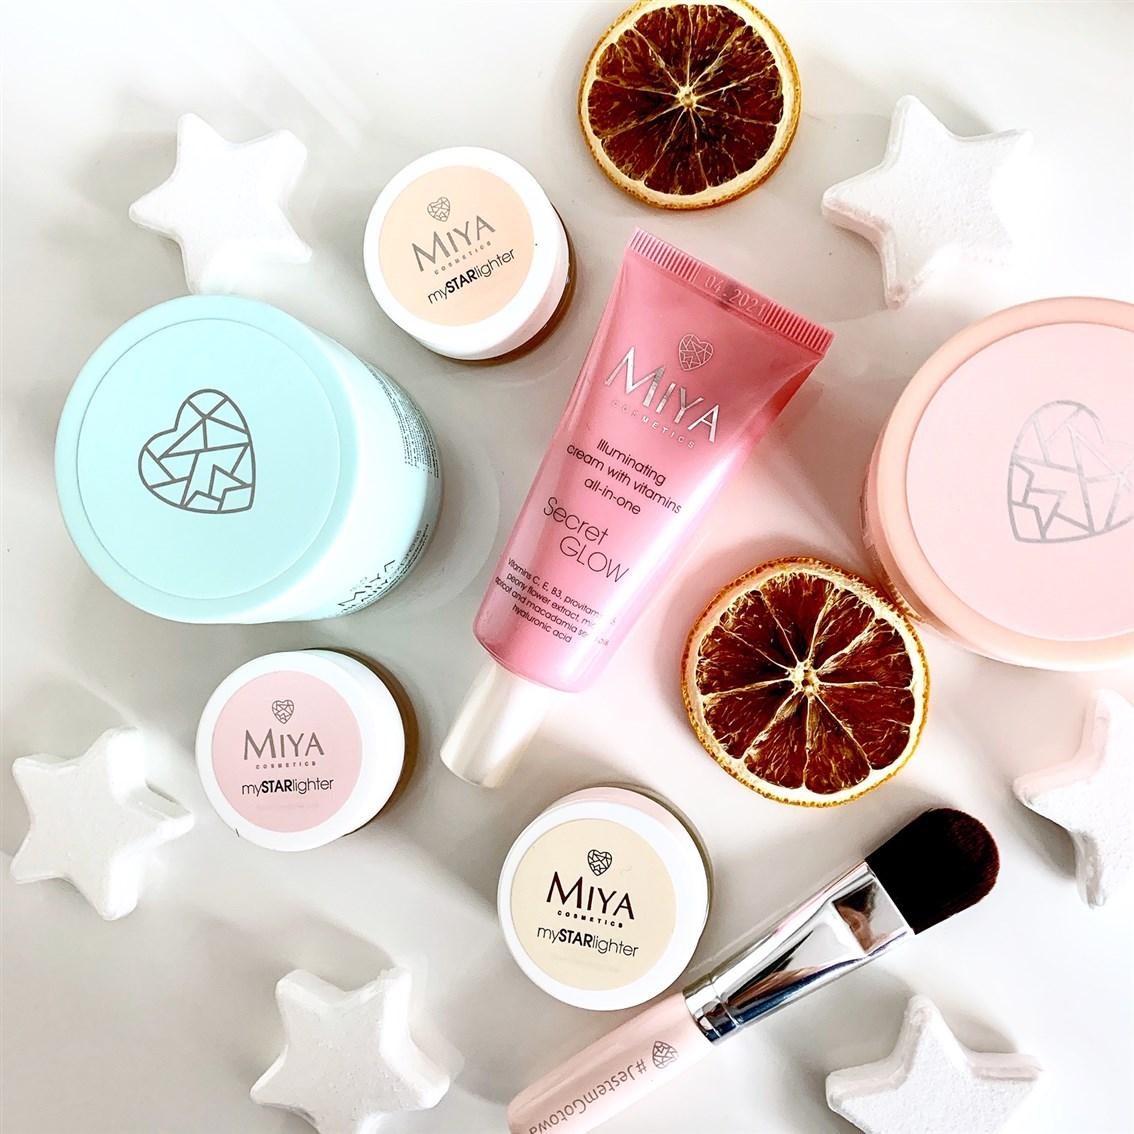 Miya Cosmetics kosmetyki